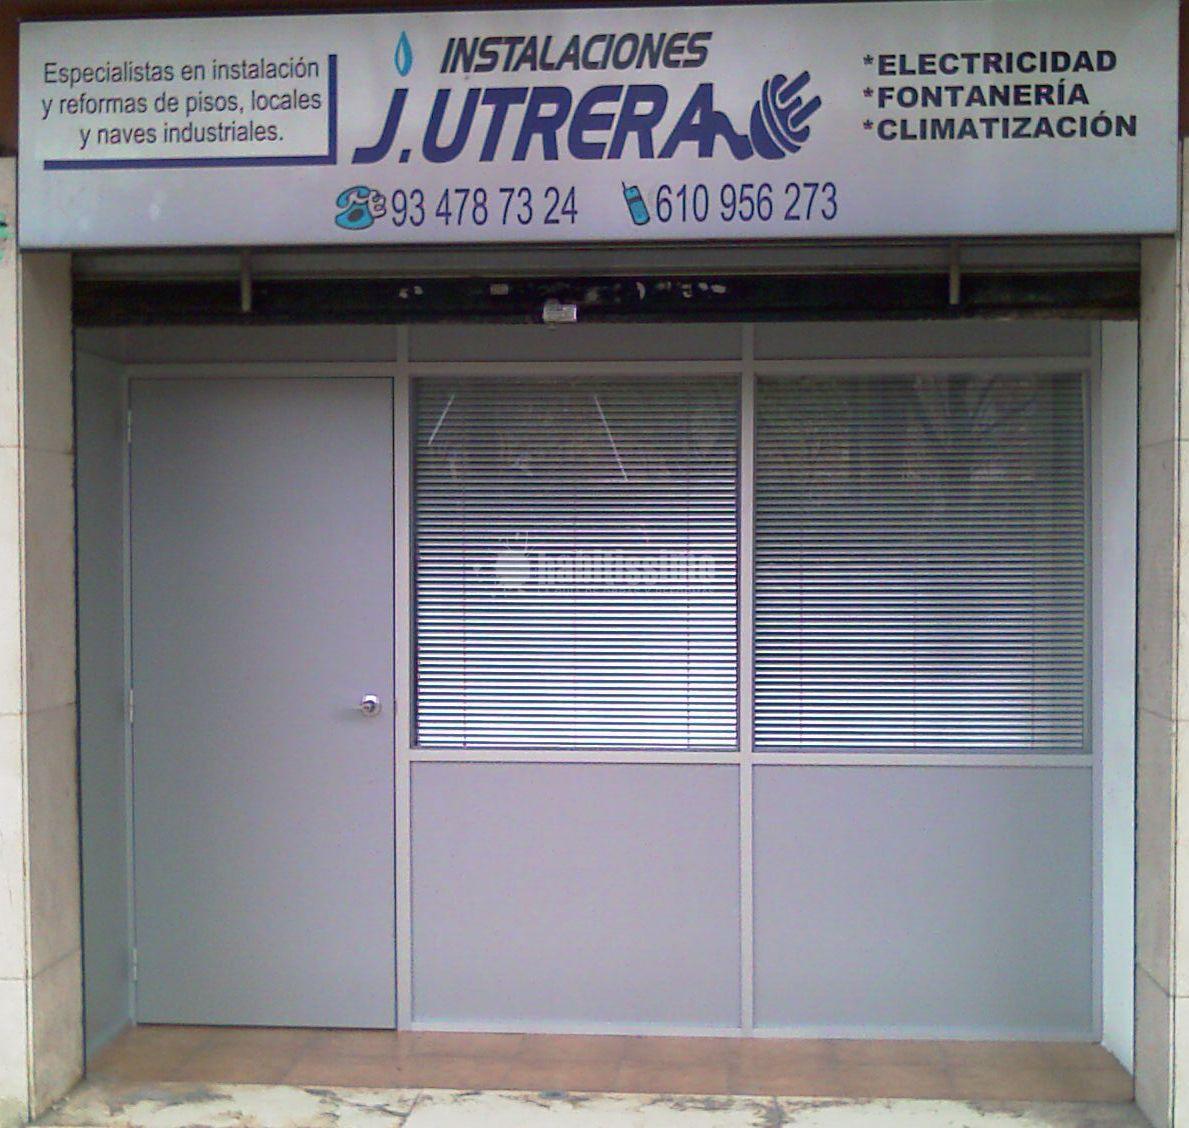 Instalaciones J.Utrera